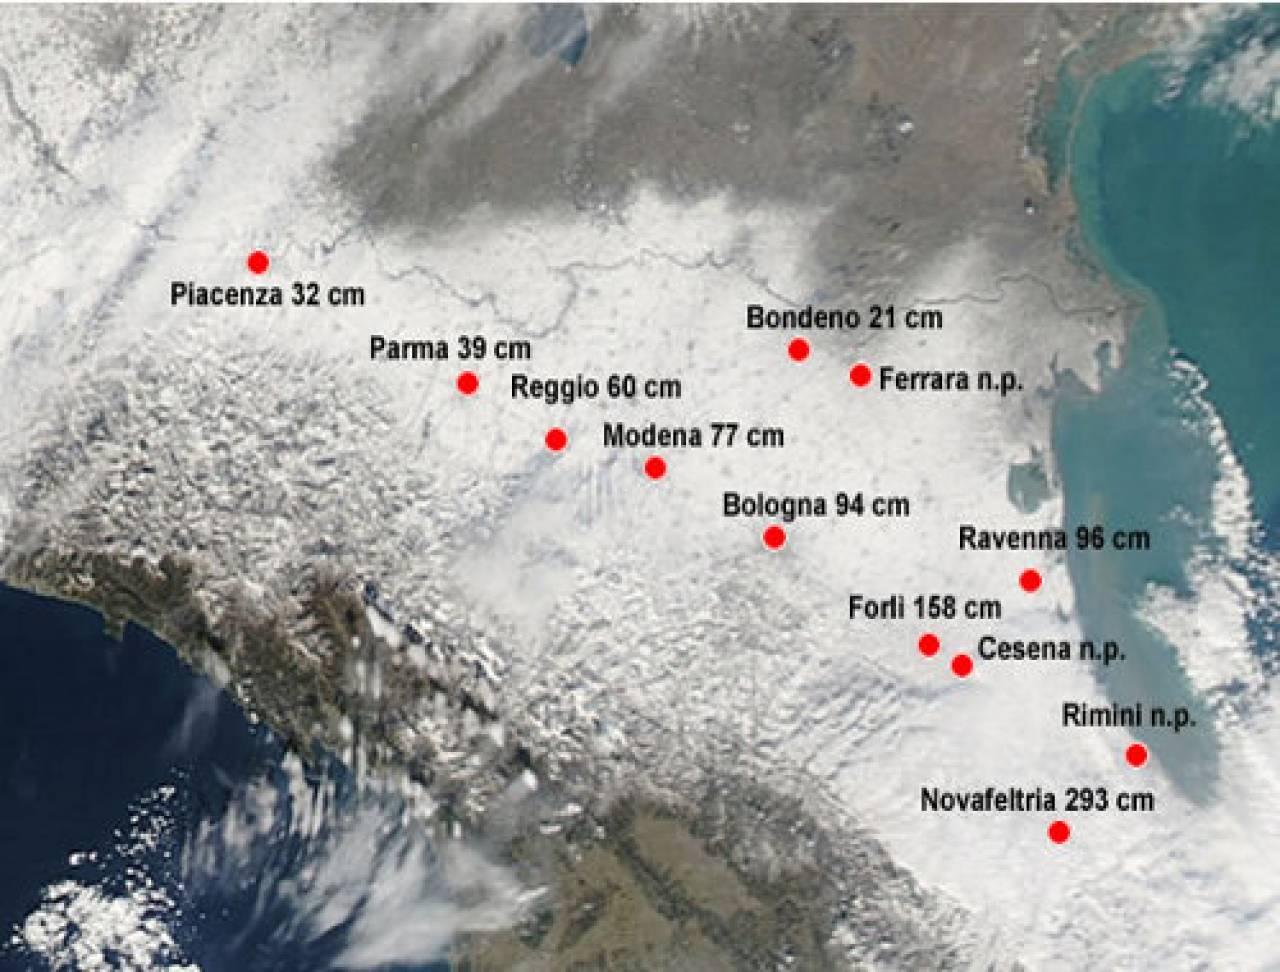 Neve emilia romagna resoconto nelle varie citt 3b meteo - Meteo bagno di romagna 15 giorni ...